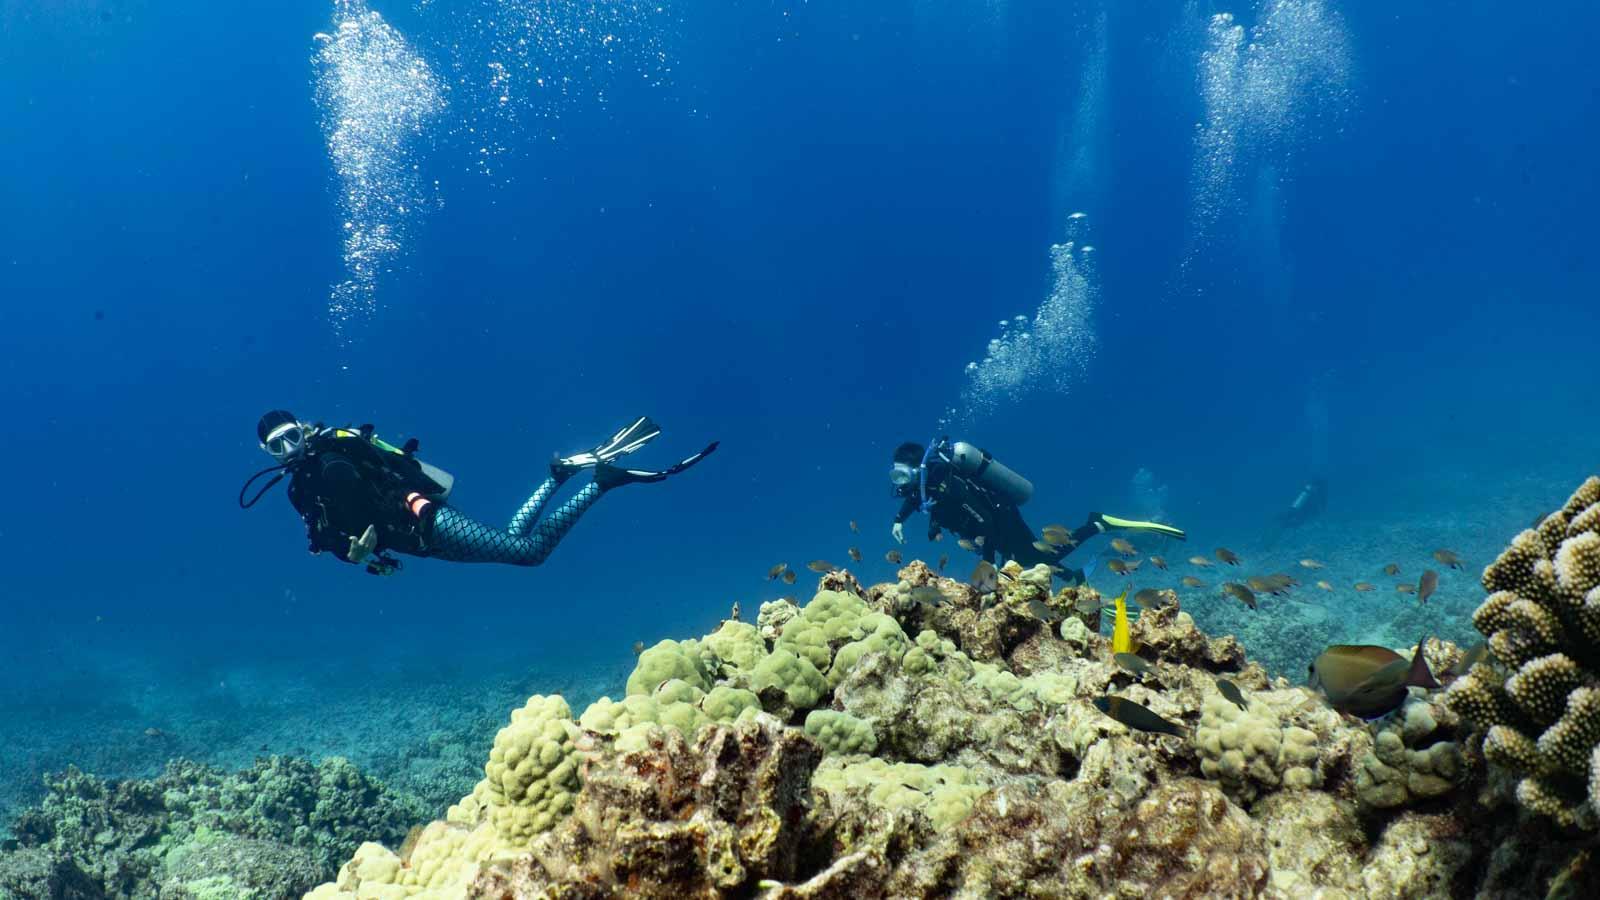 Scuba-Diving-Hawaii-Kona-Honu-Divers-15